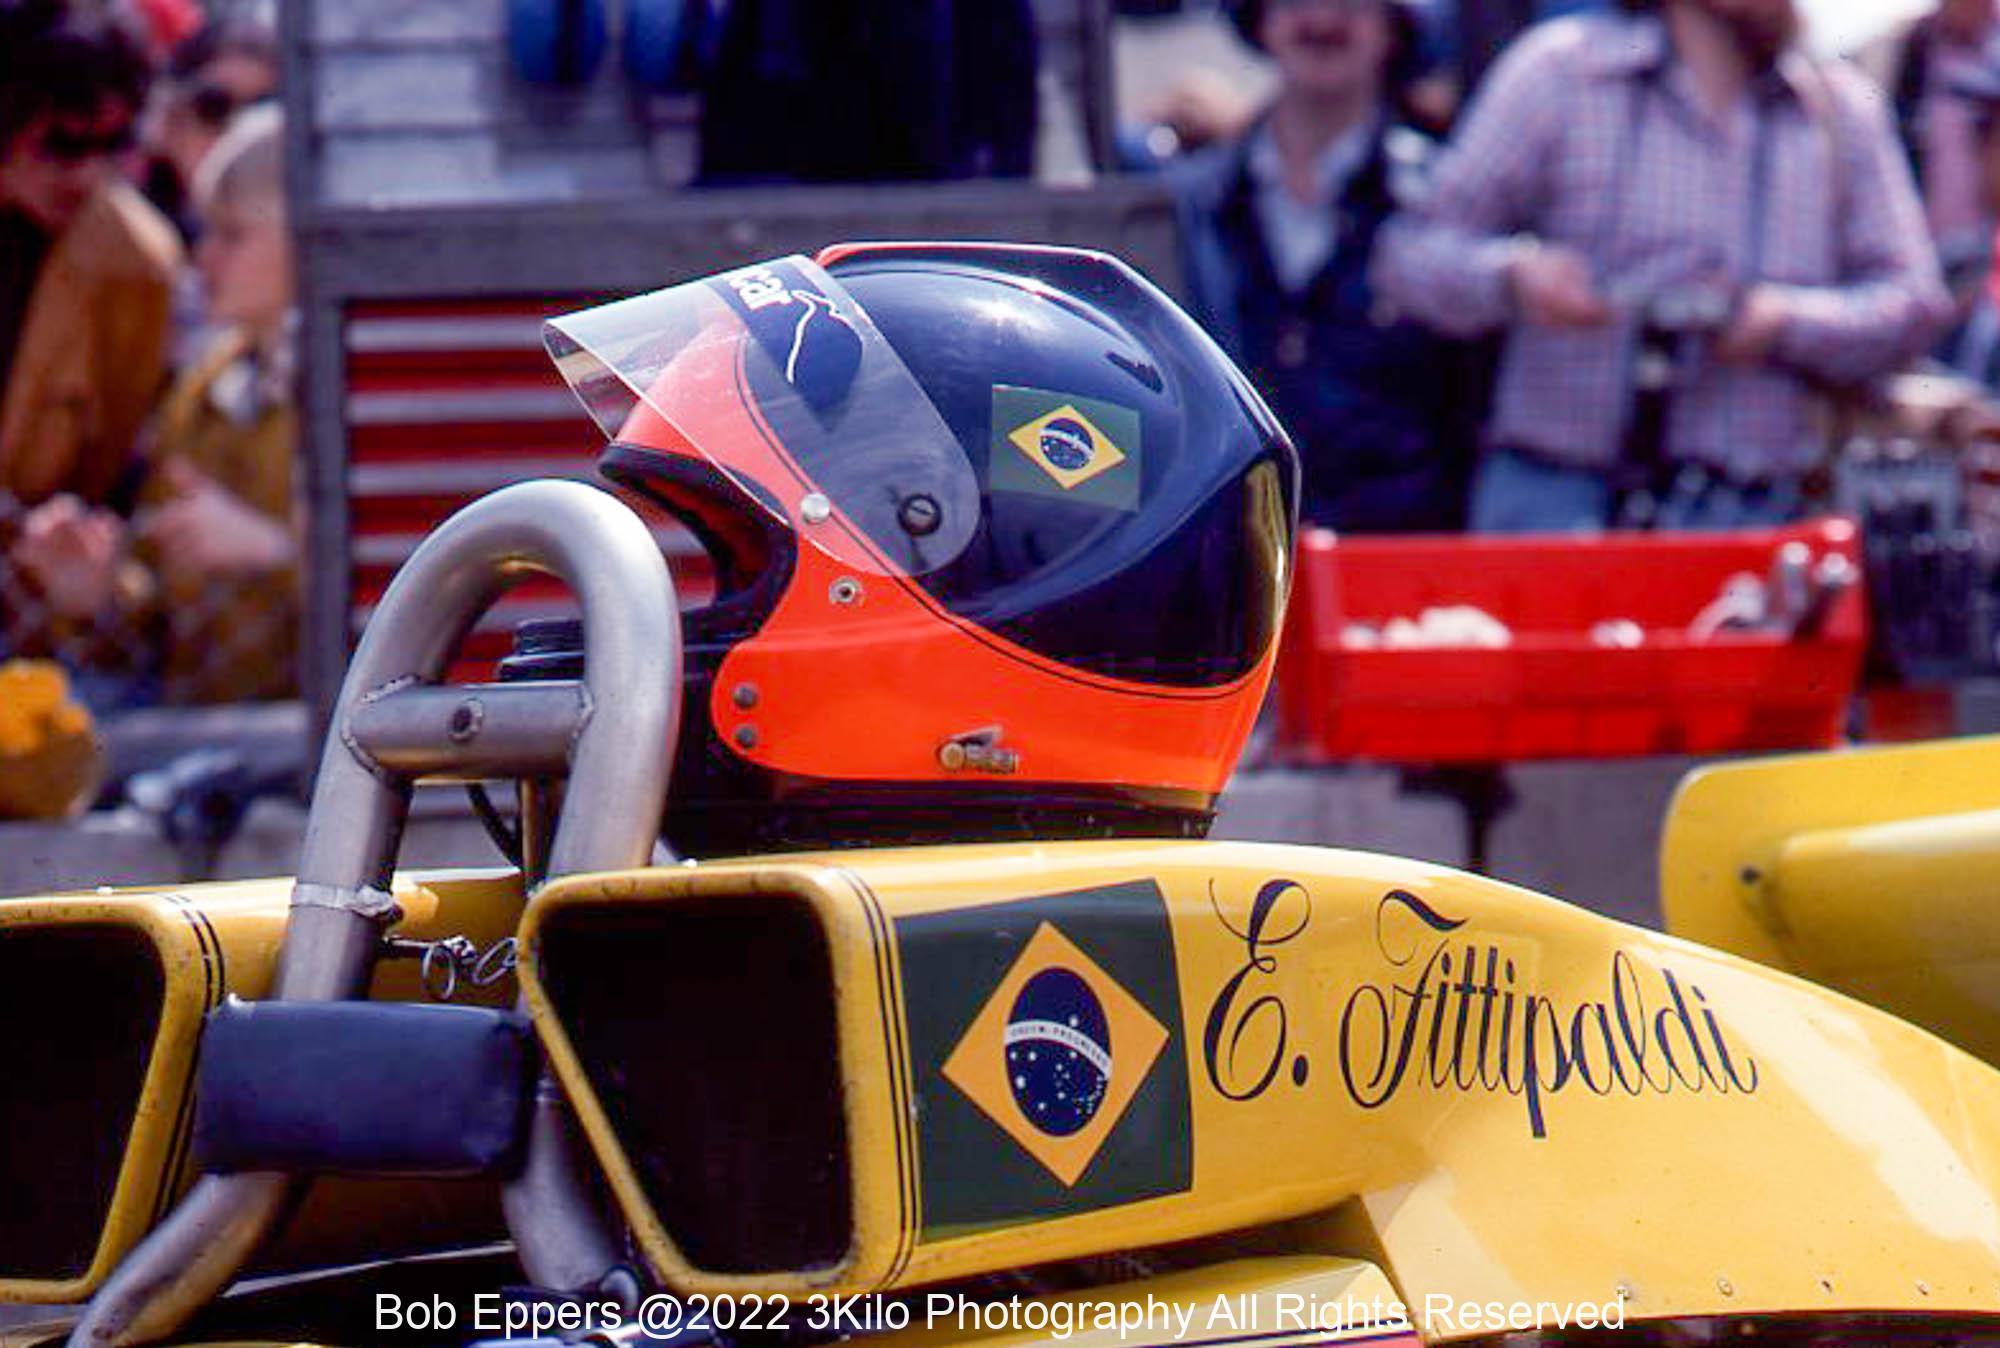 Photo of F1 Copersucar with the Helmet of driver Emerson Fittipaldi. 1977 F1 LBGP